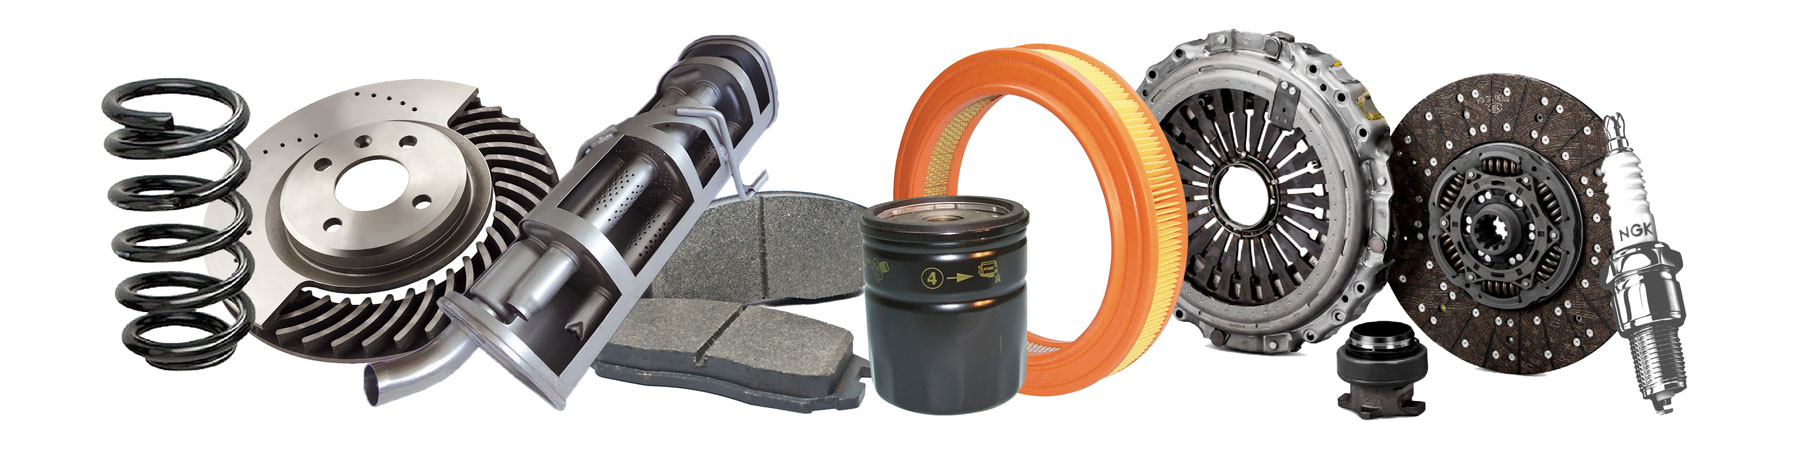 Car Parts and Components